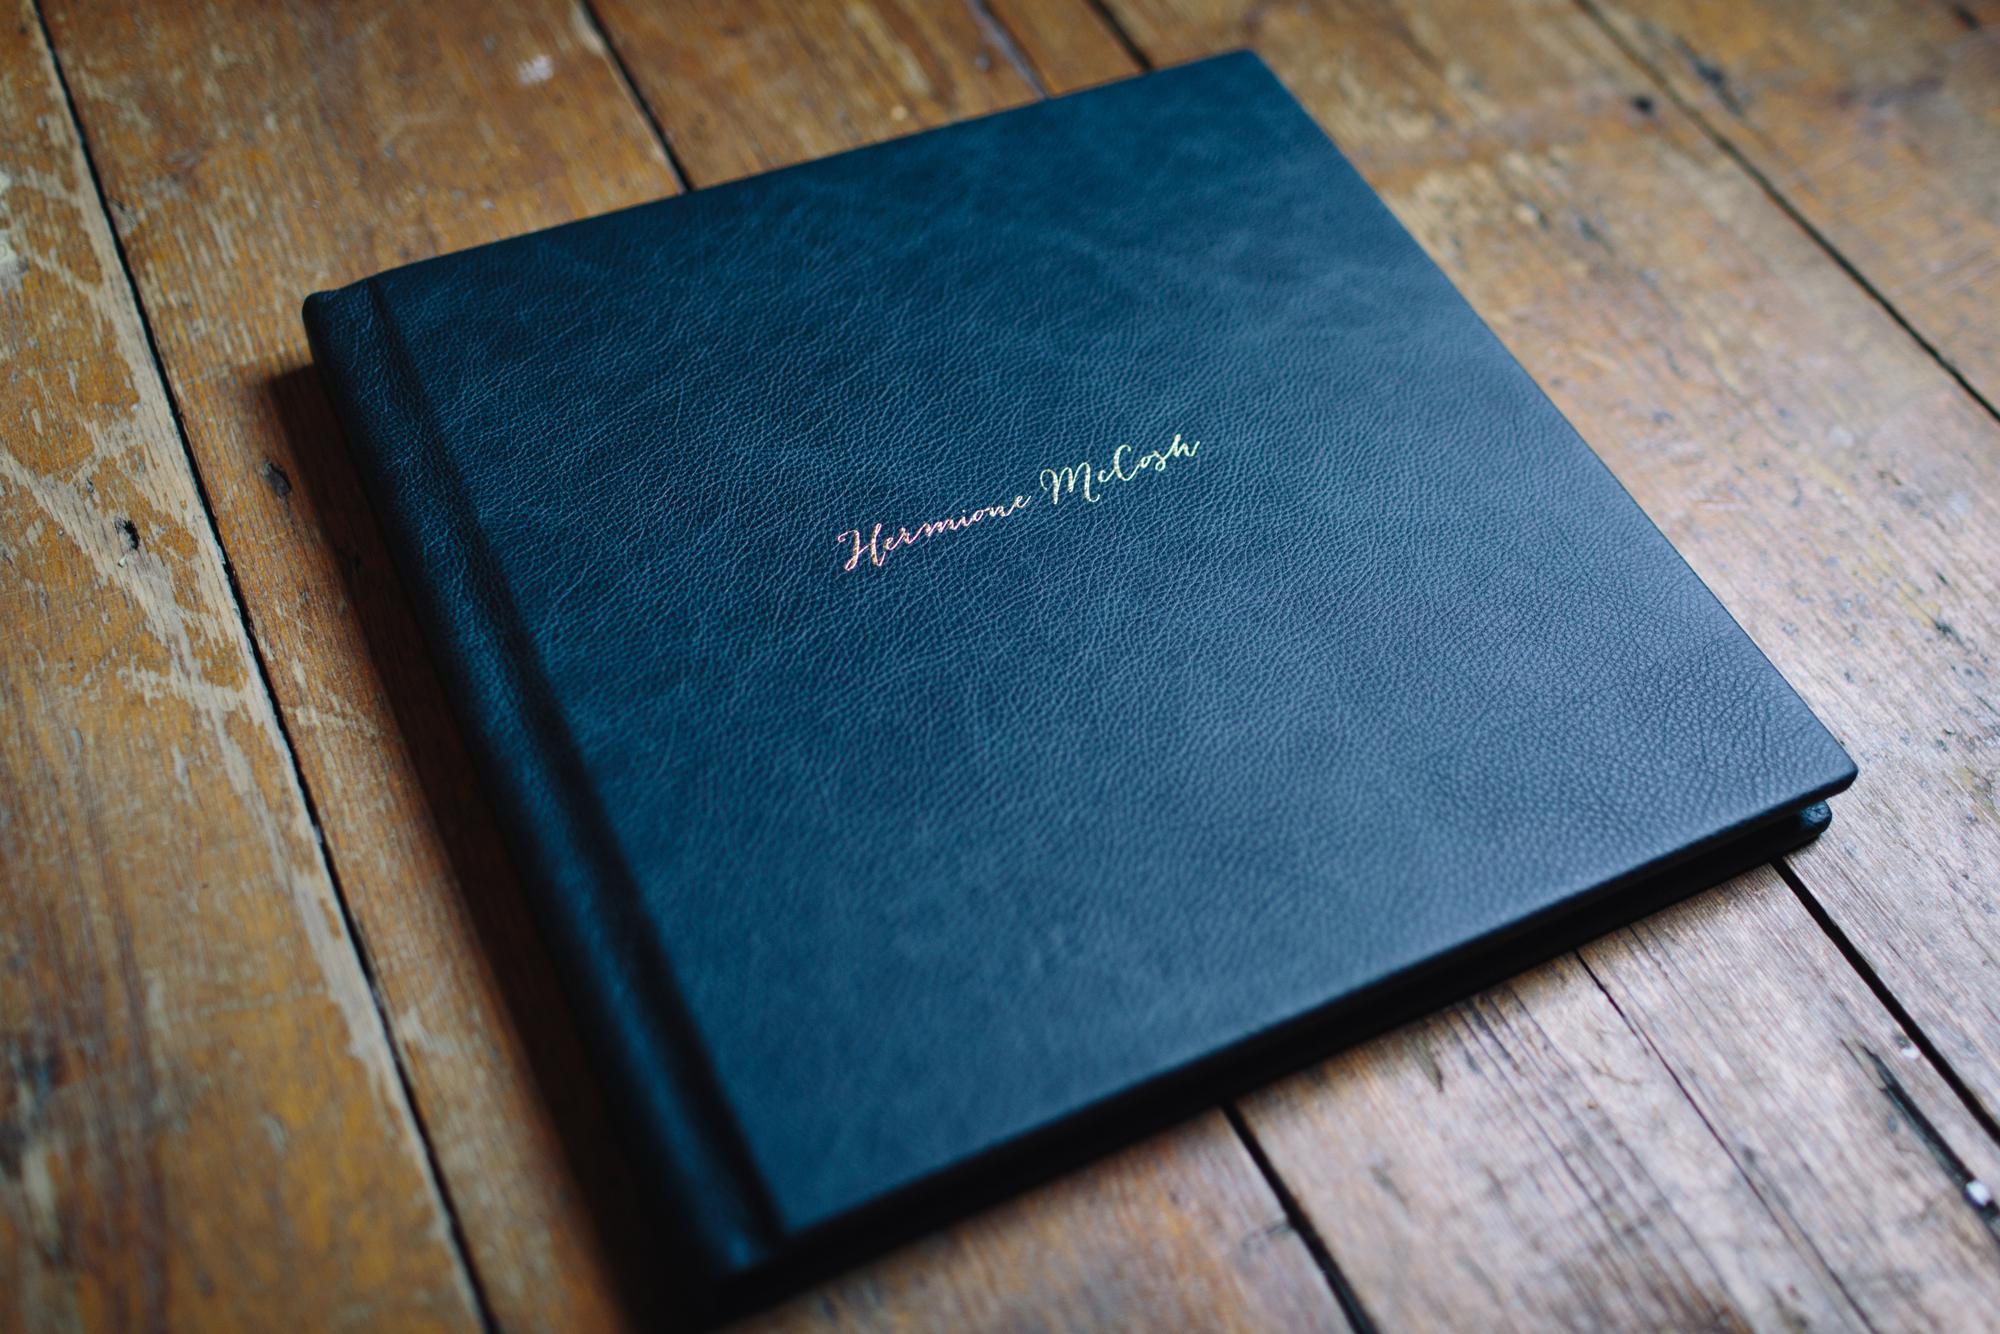 Hermione McCosh - Folio leather Wedding album